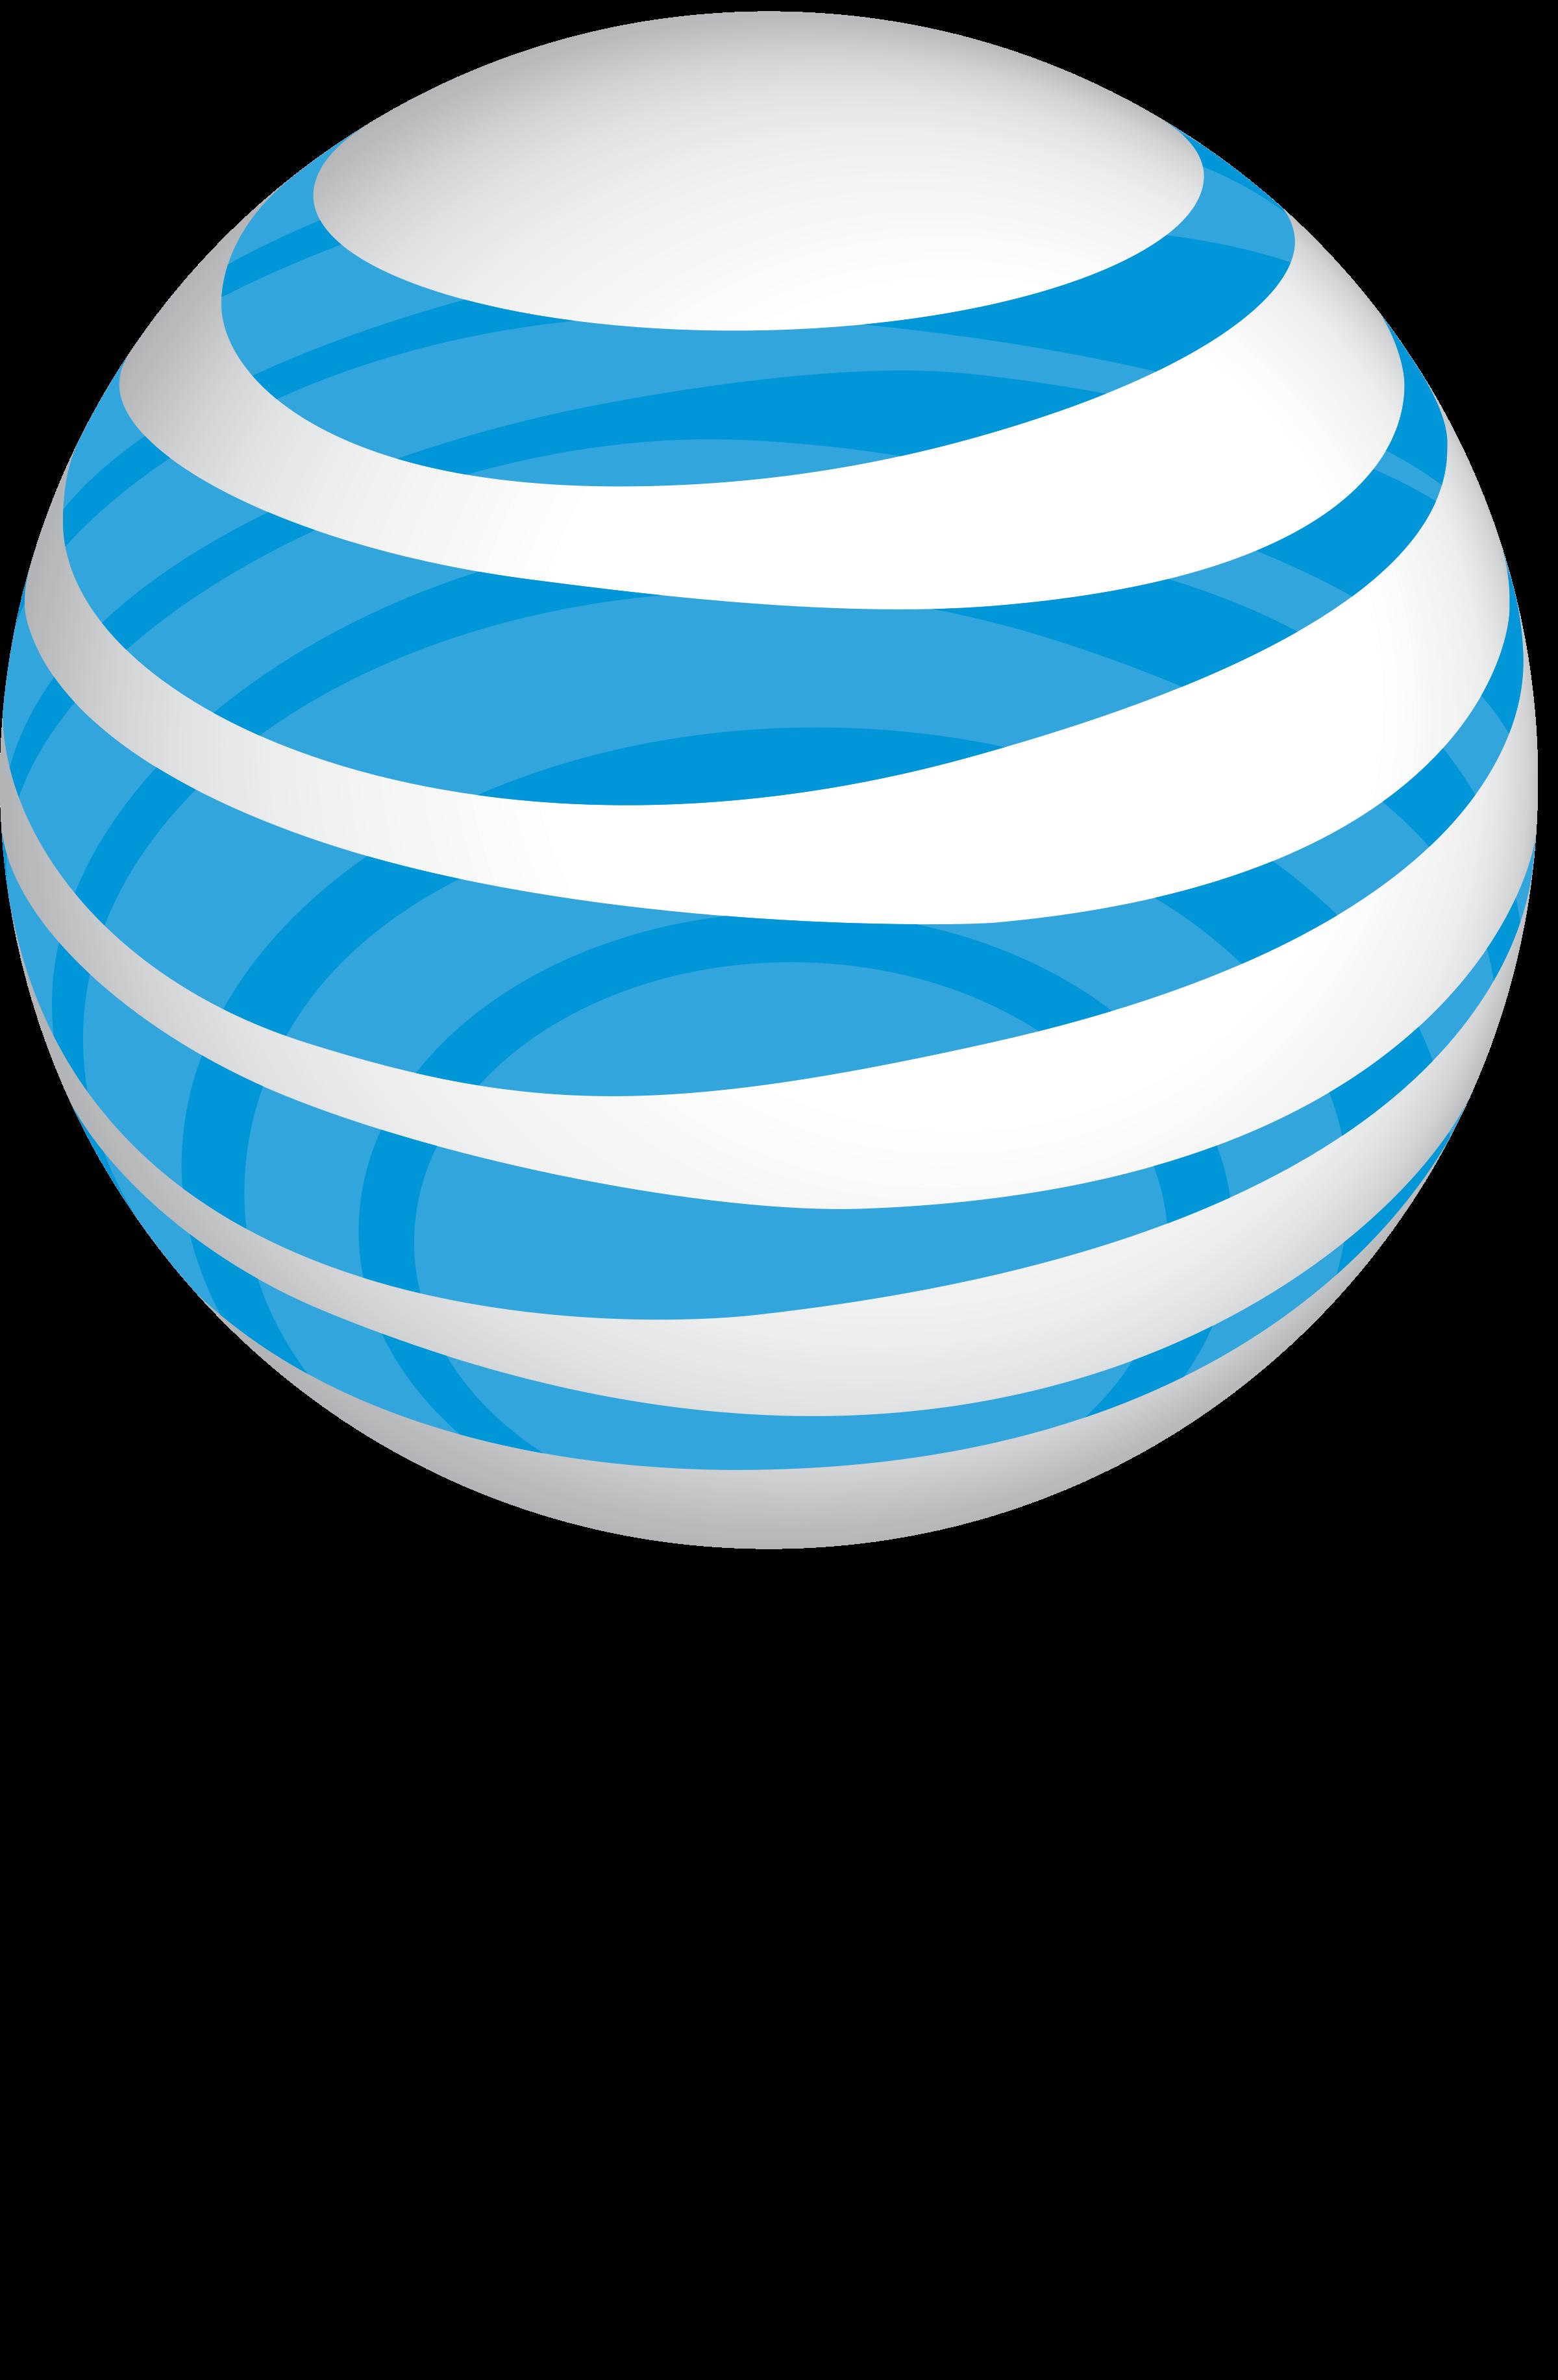 at-t-4-logo-png-transparent.png